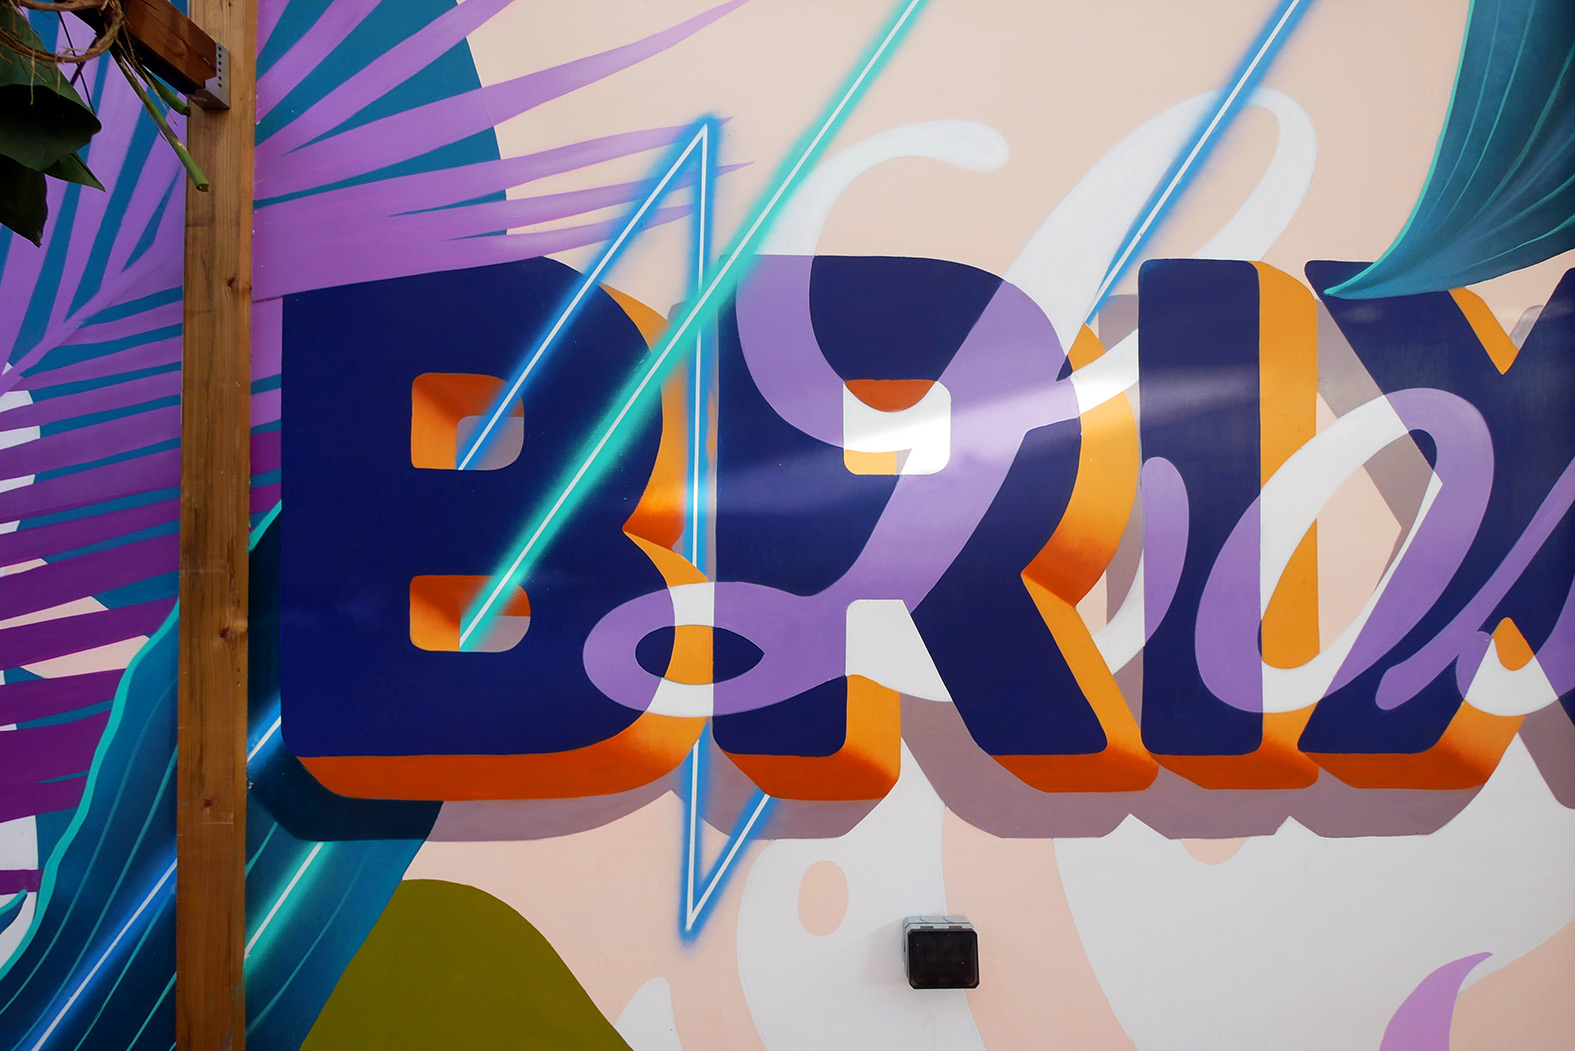 Nerone-lost-in-brixton-mural-painting-street-art-12